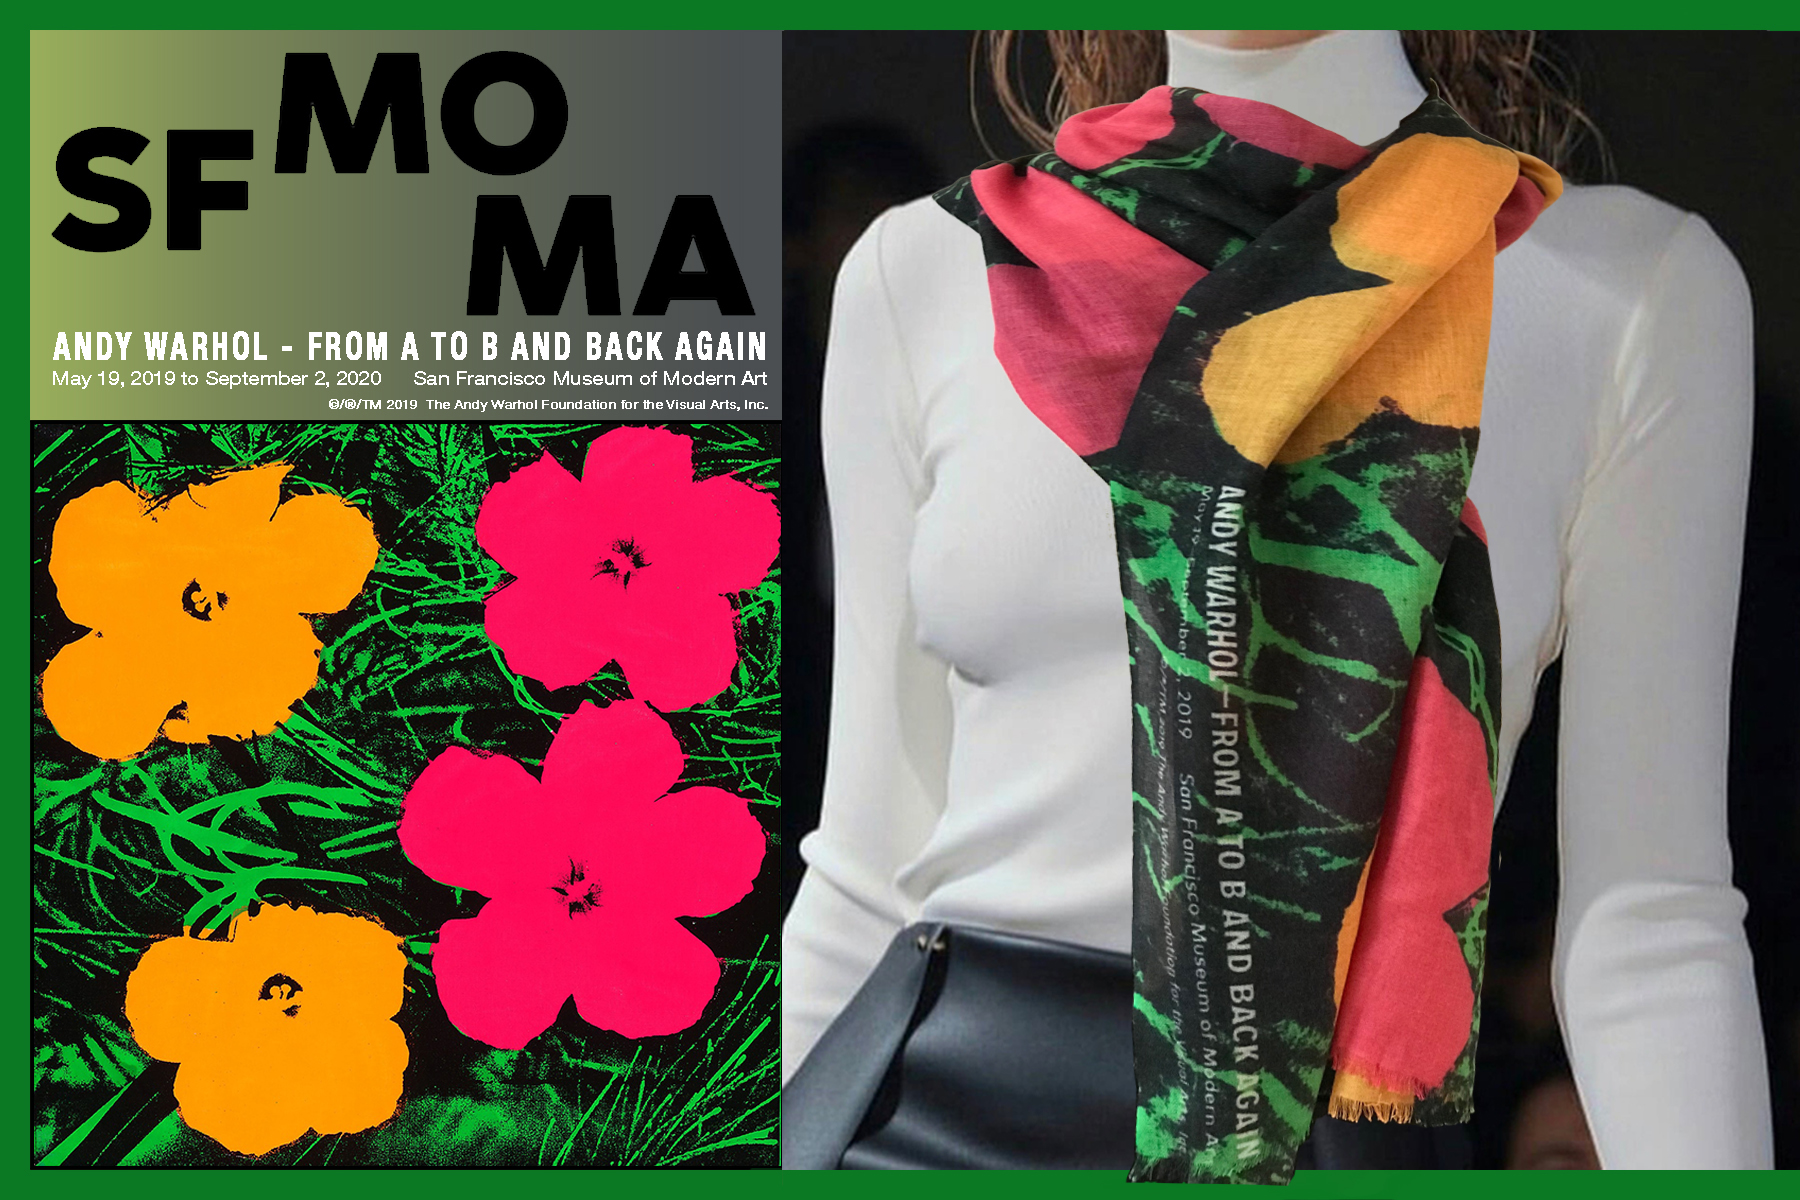 SFMOMA Andy Warhol 7-5.jpg